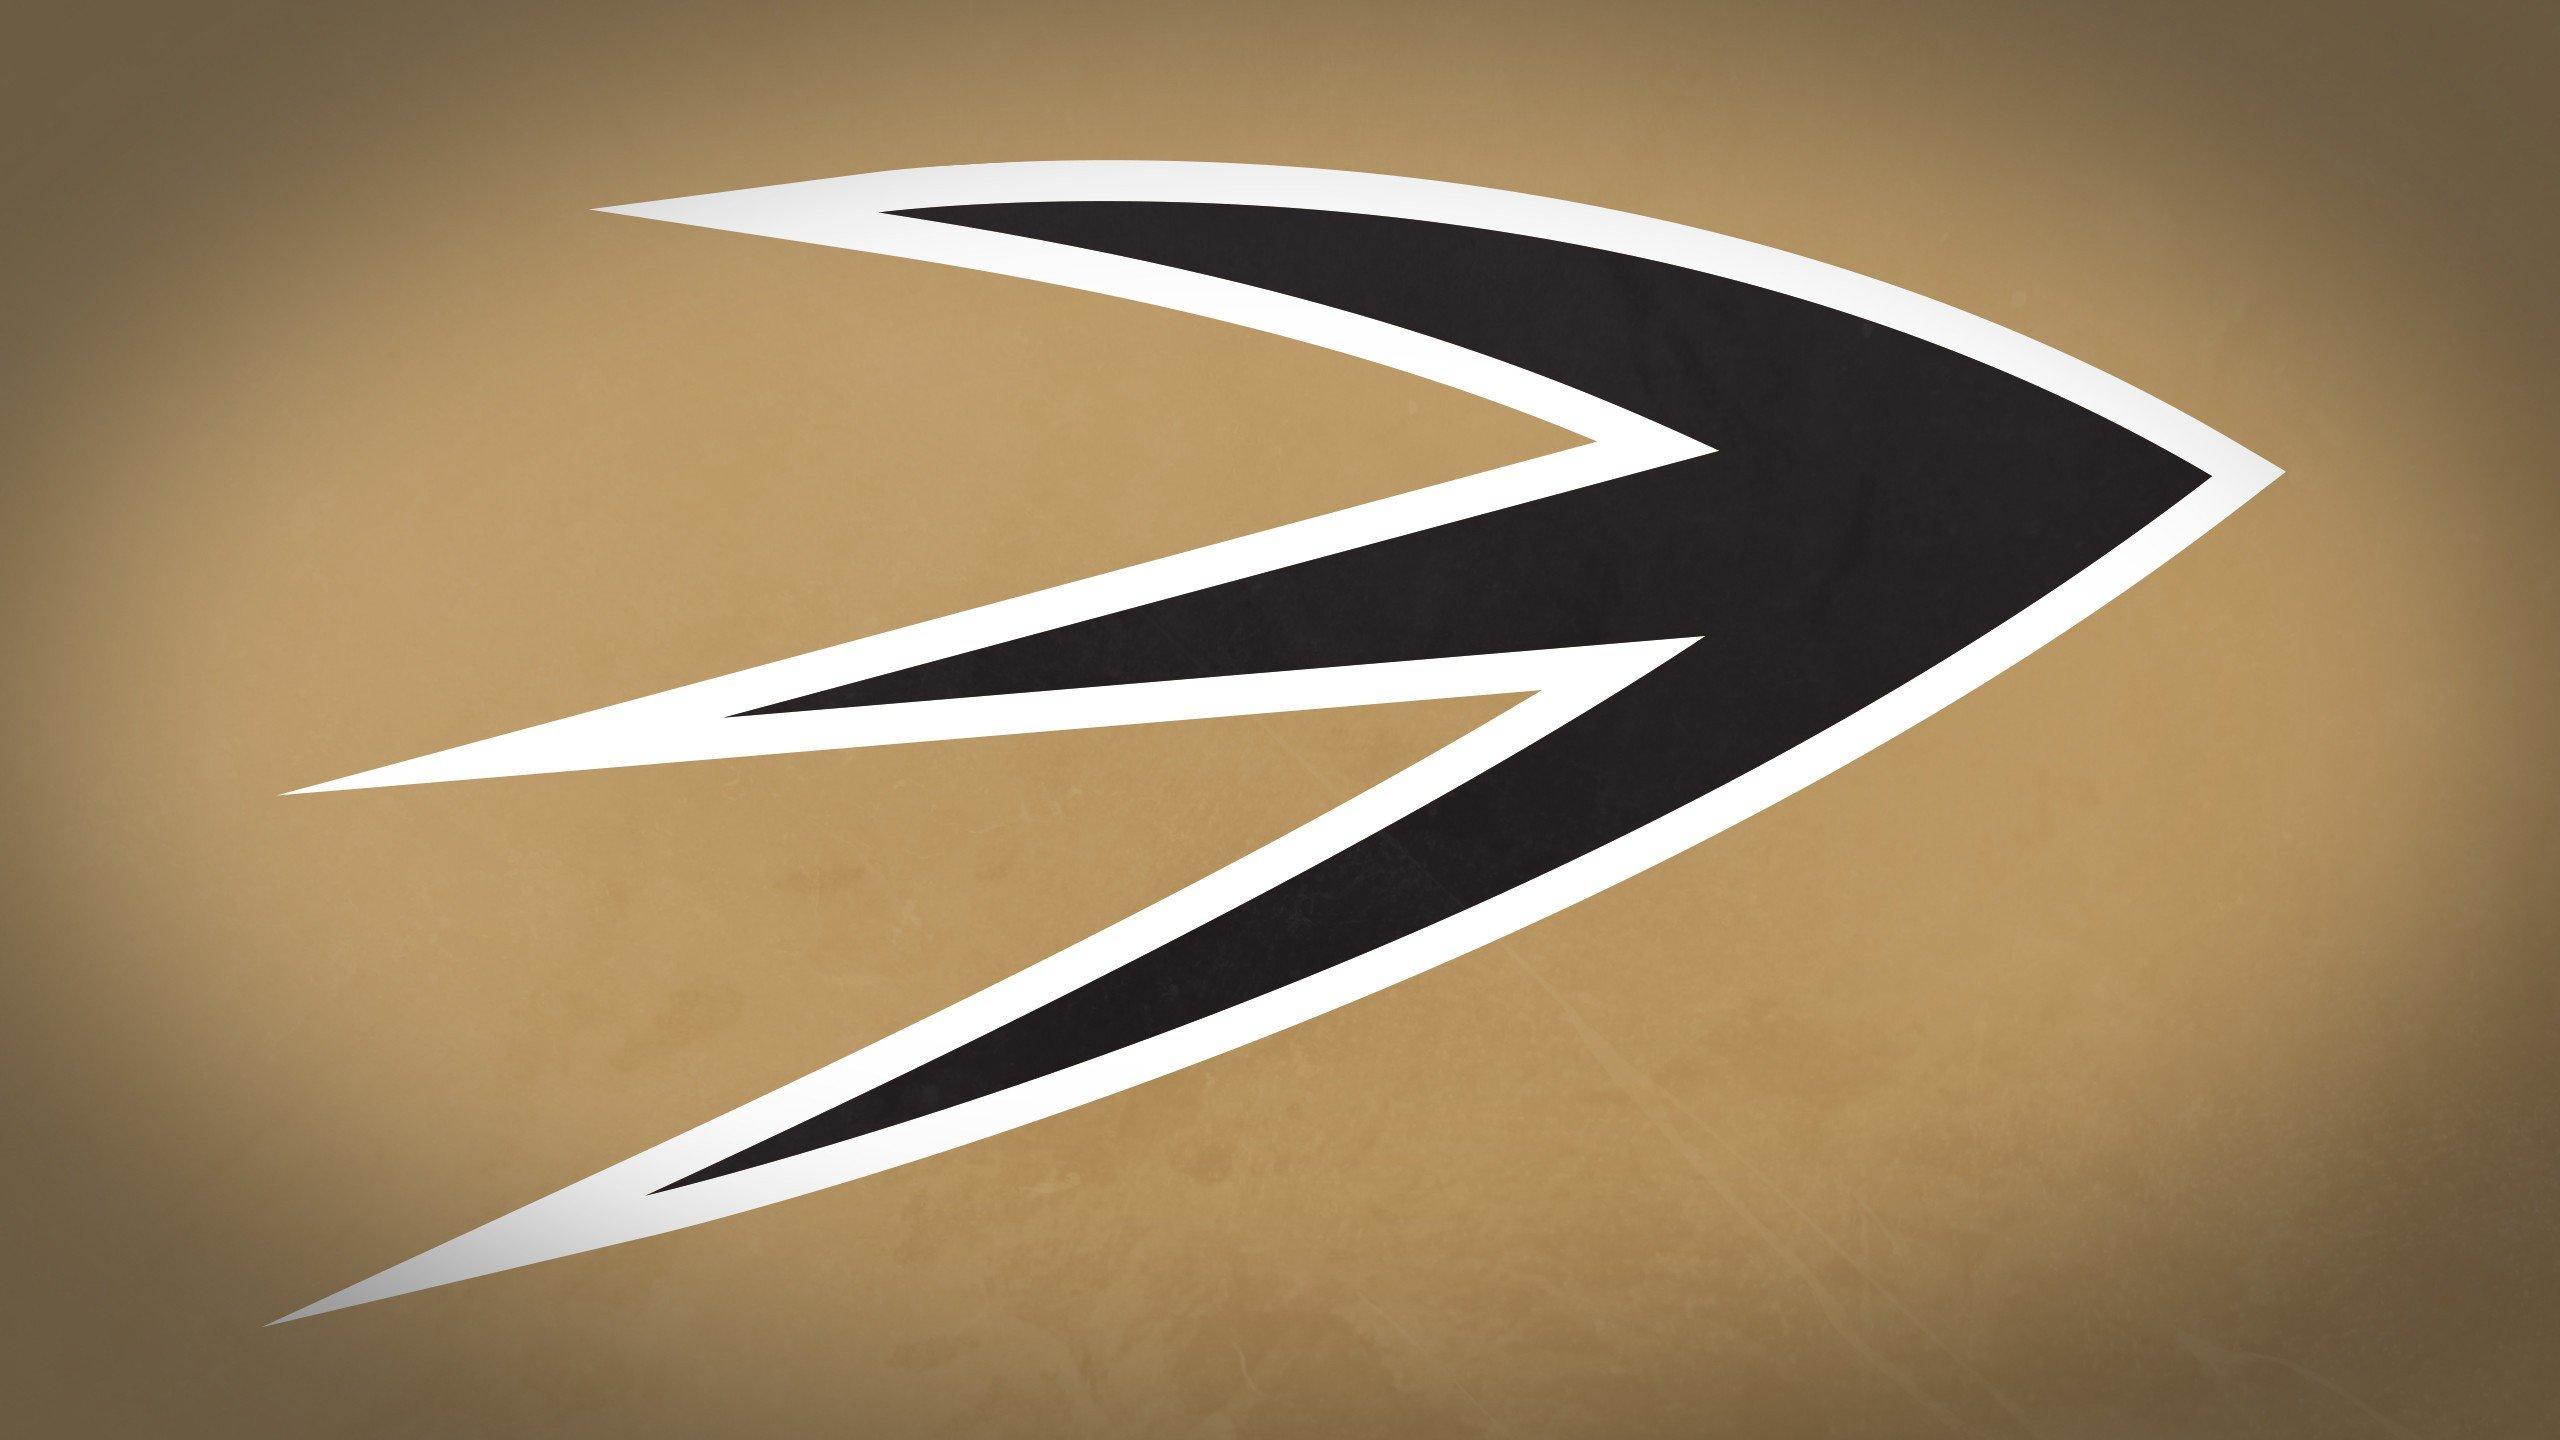 Download Anaheim Ducks Wallpaper Wallpaper Apps Directories 2560x1440